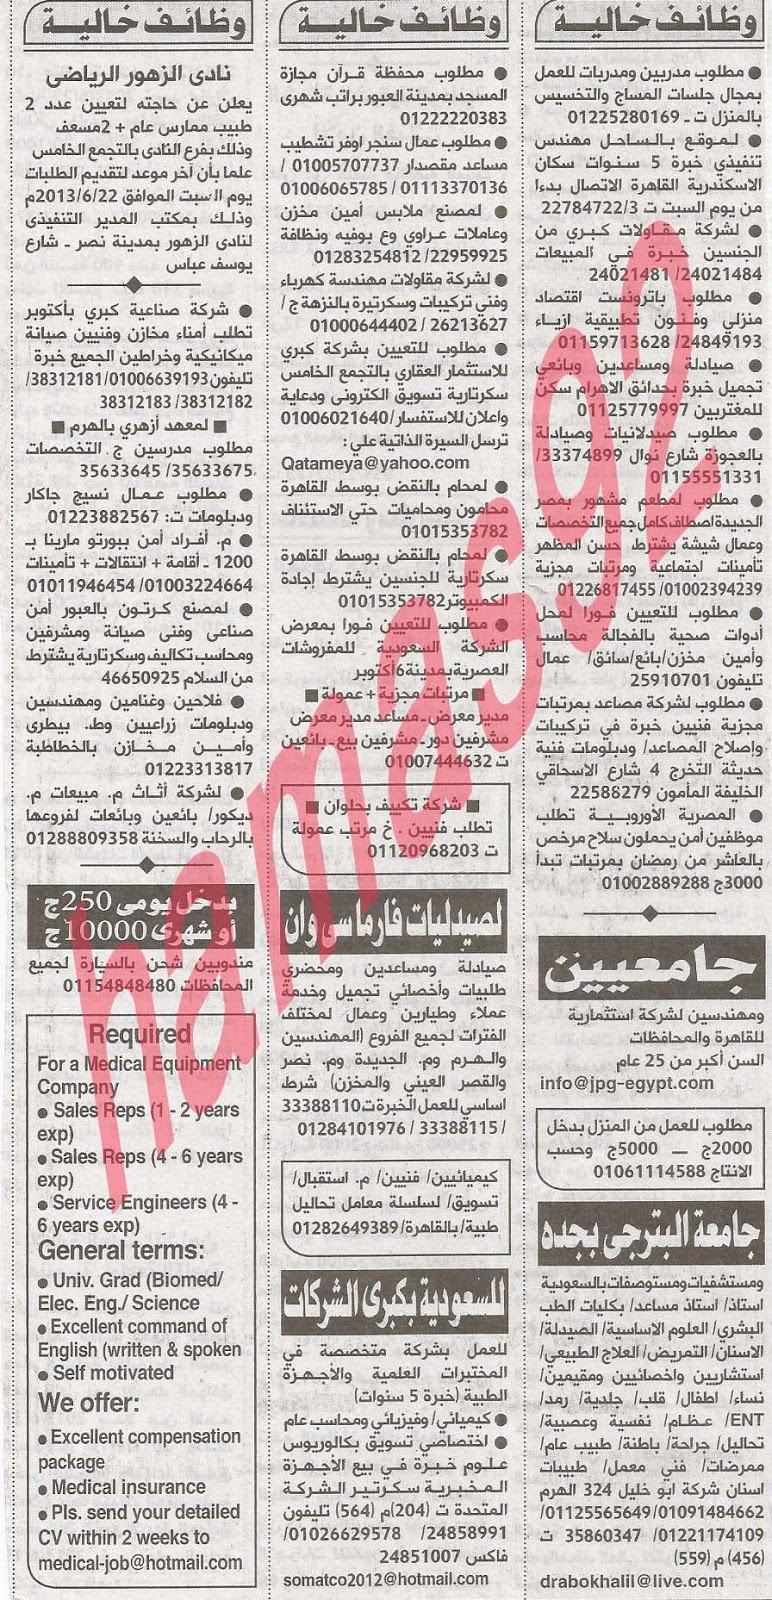 14beebaa2 ووظائف اخرى فى وظائف جريدة الاهرام الجمعة 14/6/2013